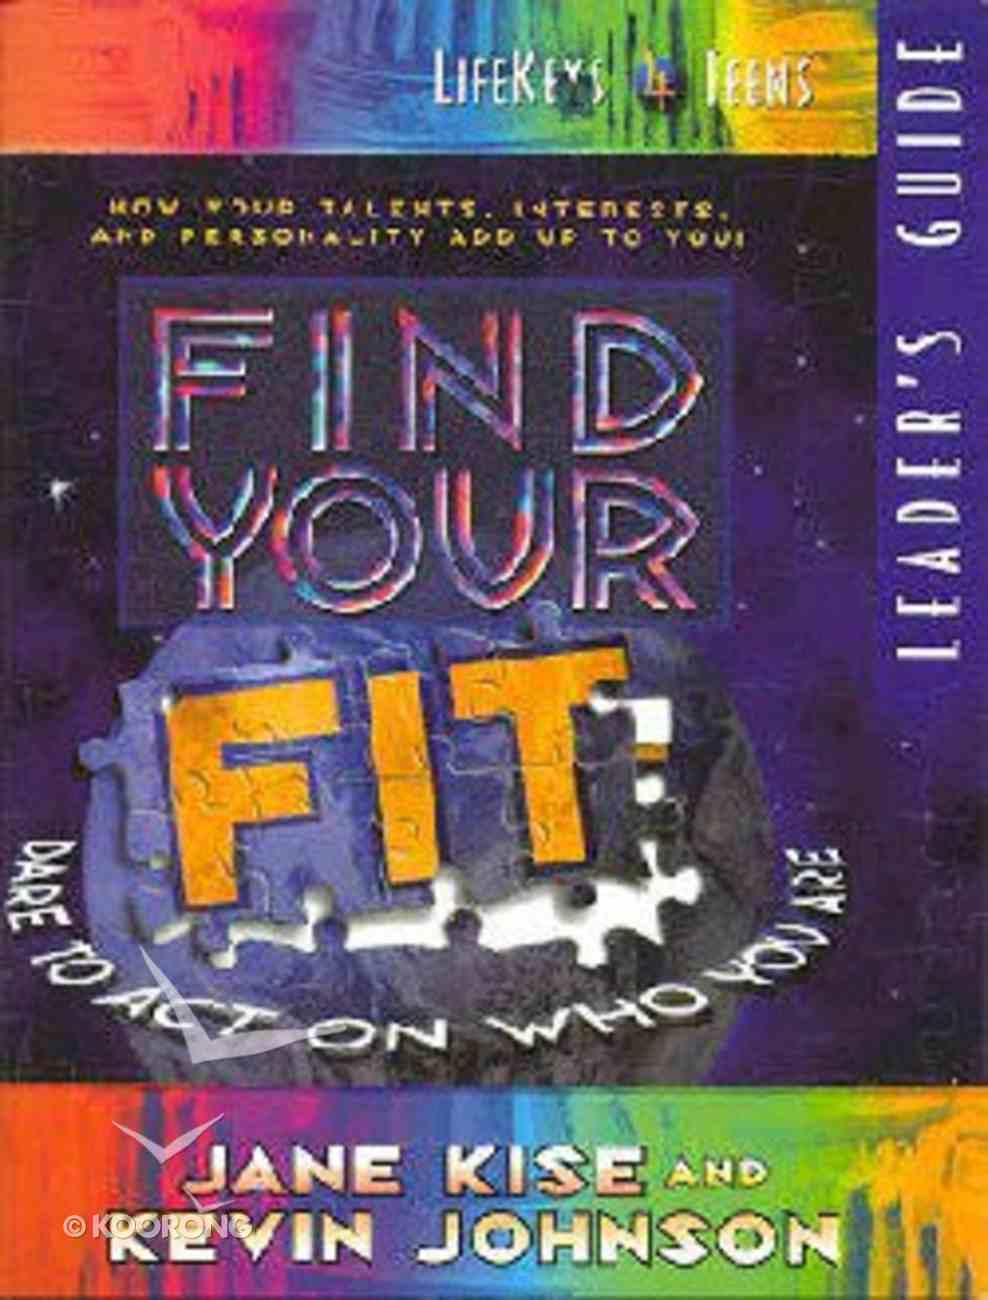 Lifekeys 4 Teens: Find Your Fit (Leader's Guide) Paperback